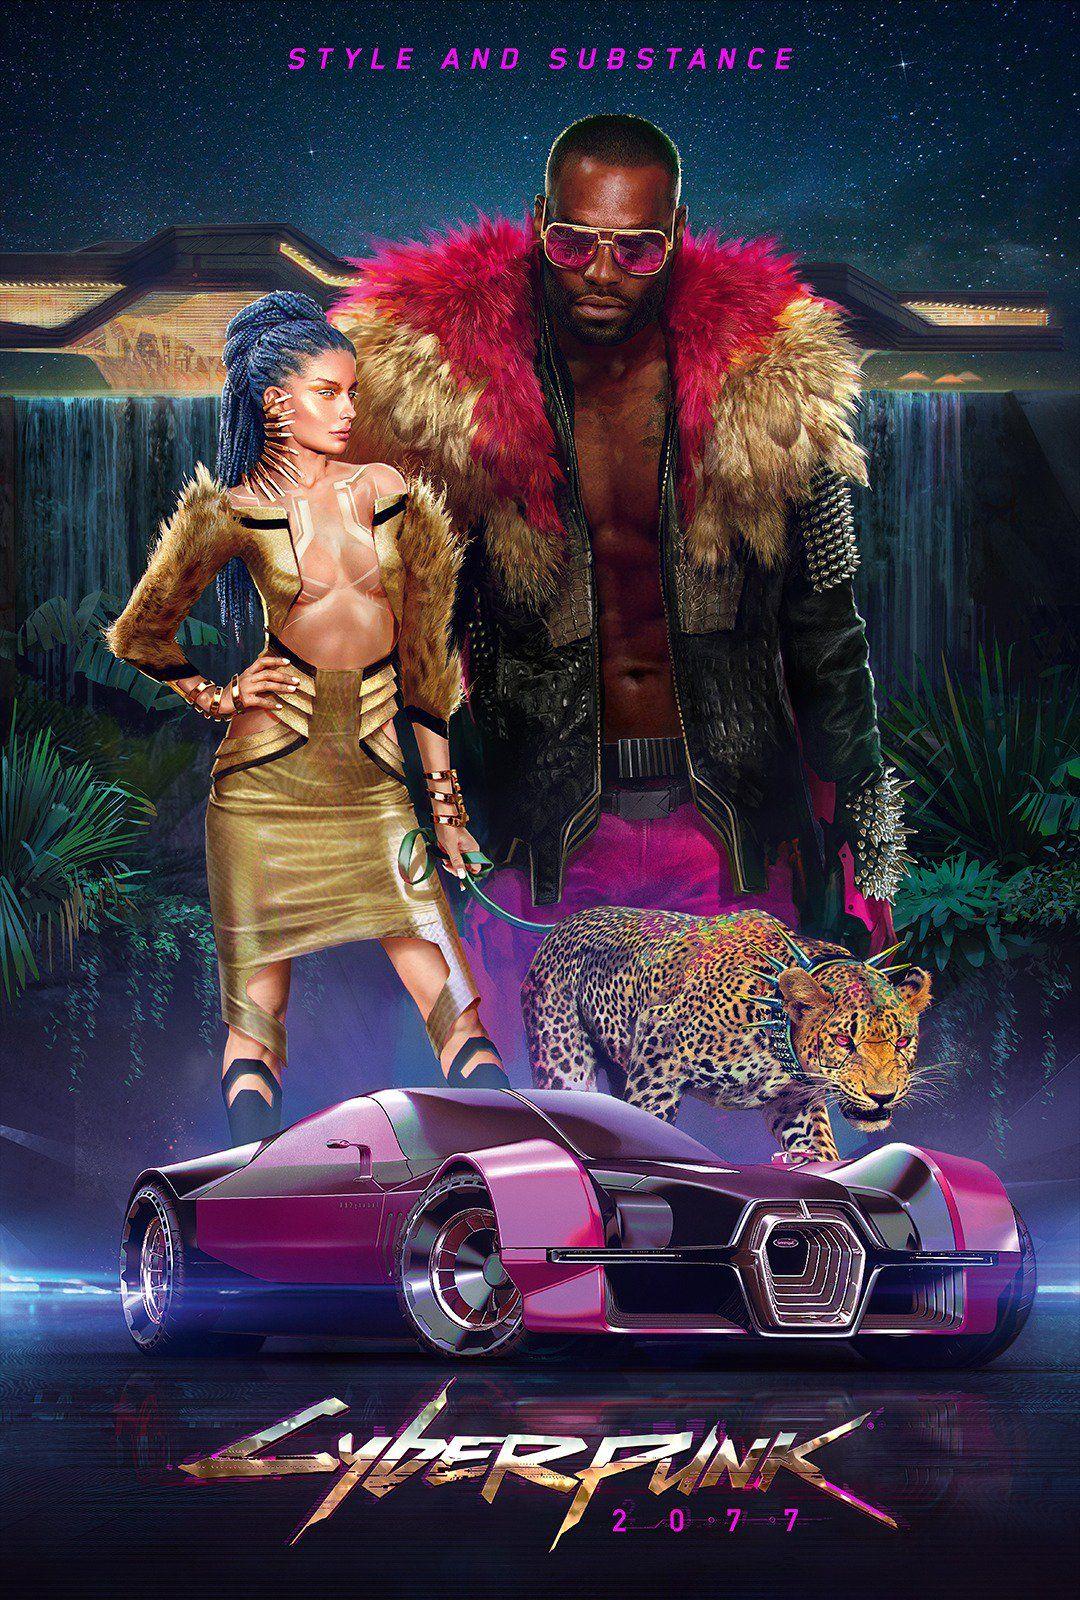 Cyberpunk 2077 on in 2020 Cyberpunk 2077, Cyberpunk city